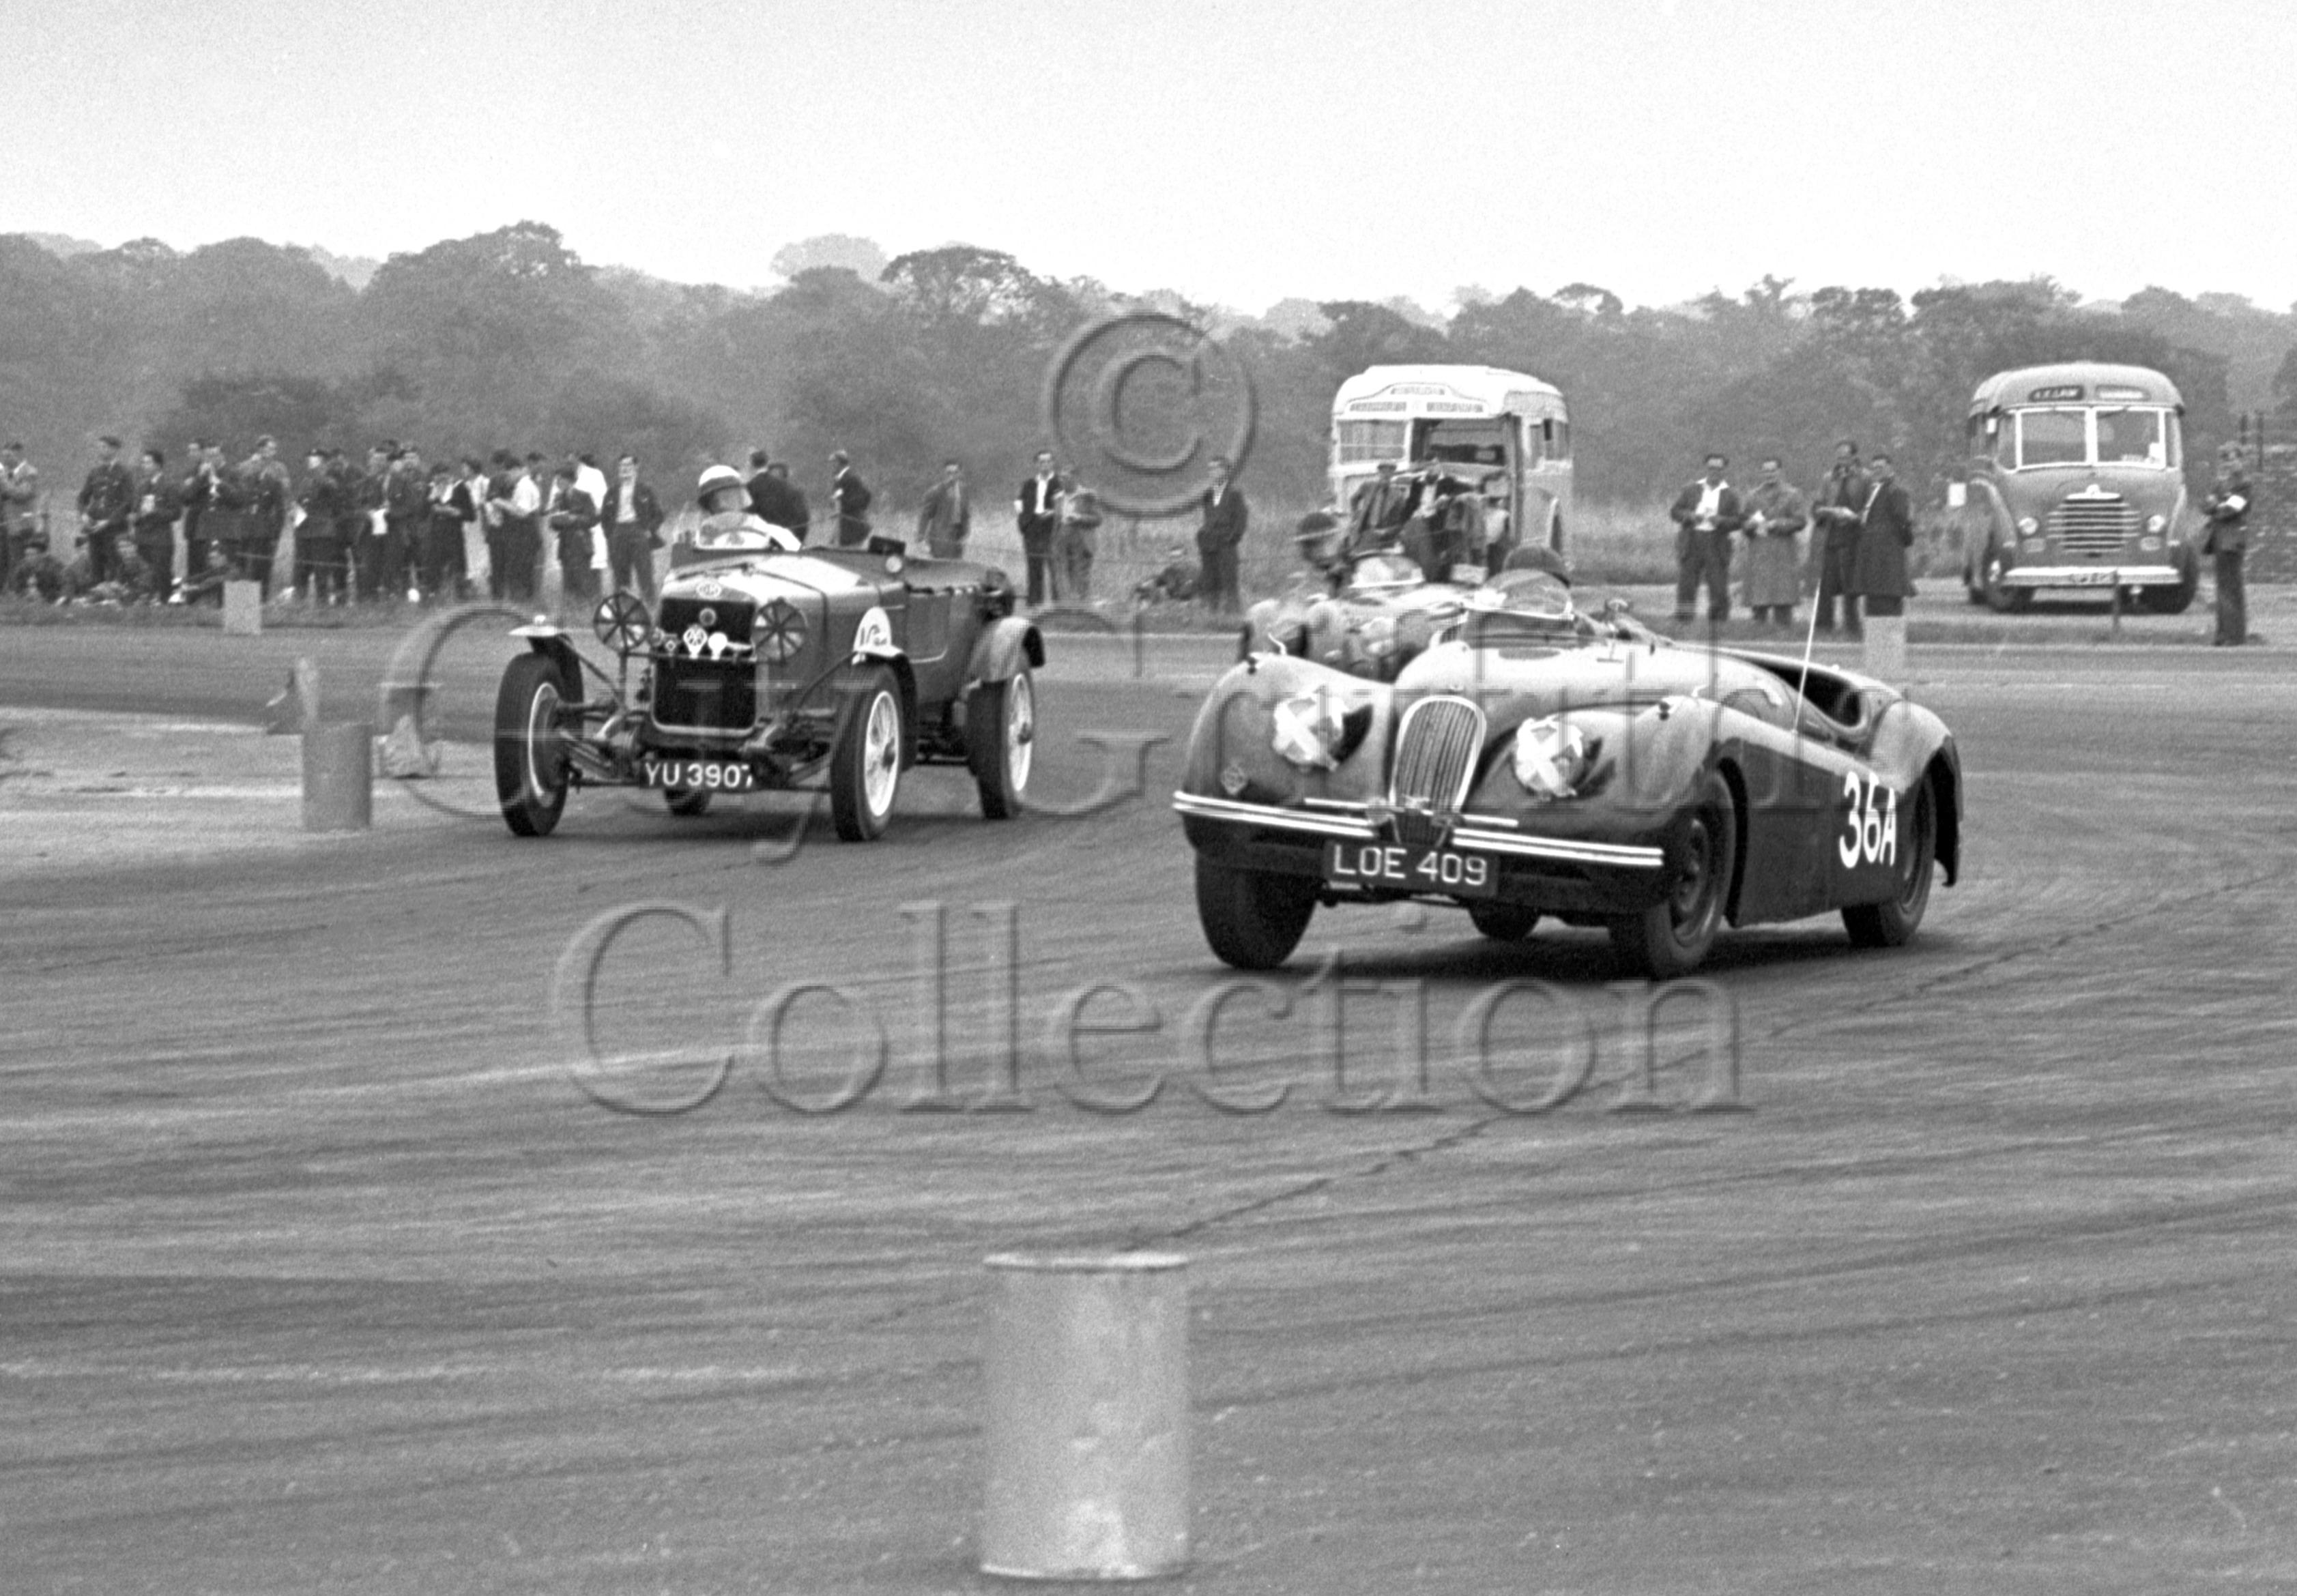 60-571–D-O'M-Taylor–Jaguar-XK-120-LOE-409–Silverstone–30-08-1952.jpg - Guy Griffiths Collection